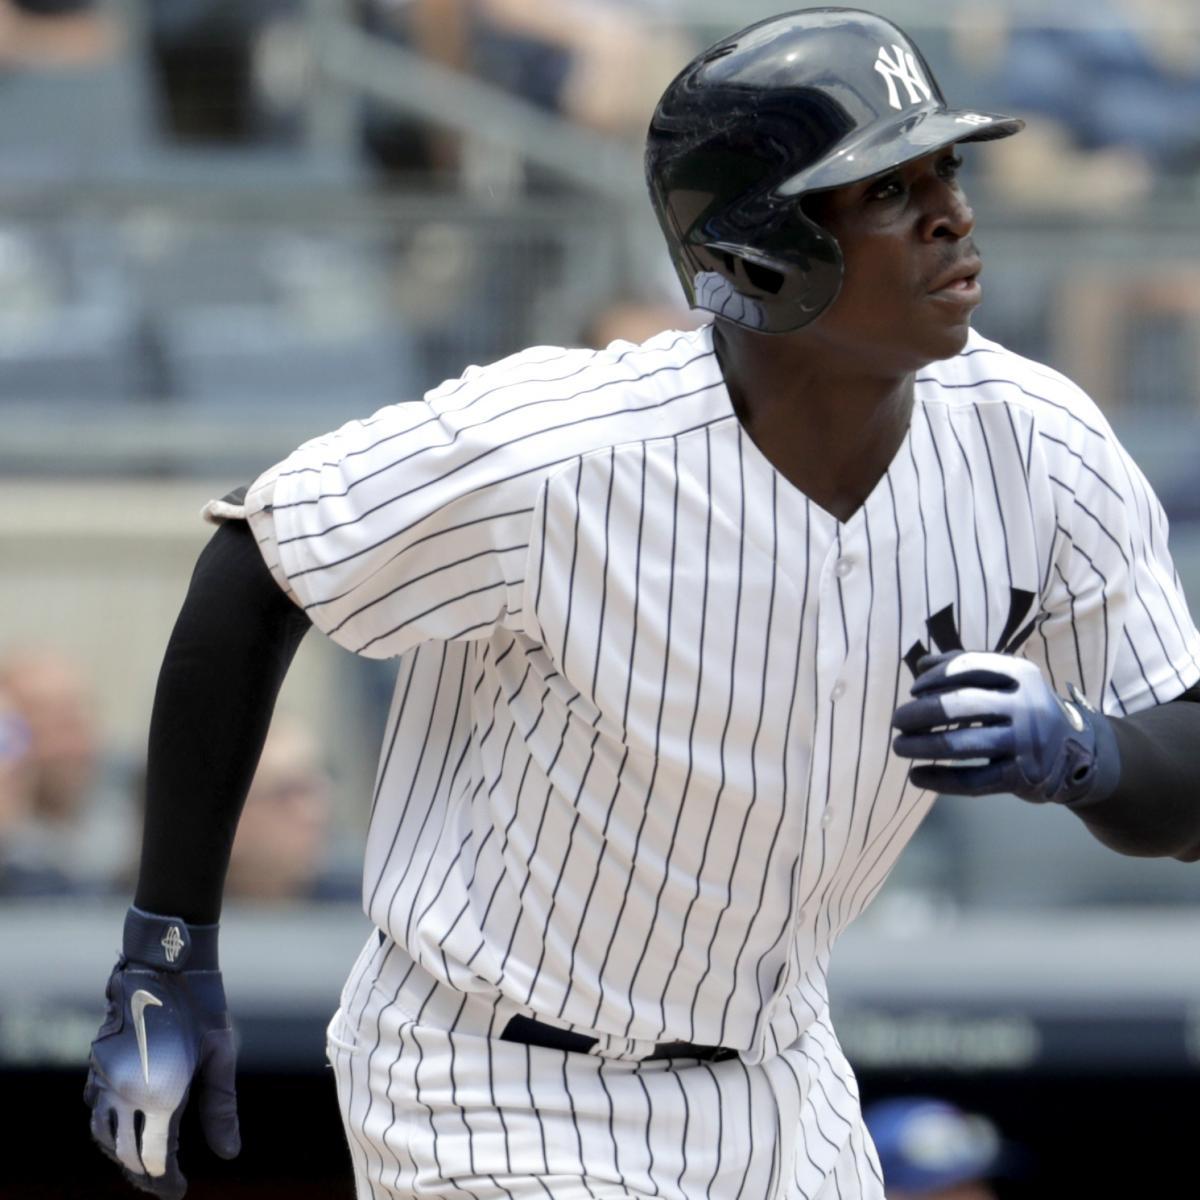 Yankees' Didi Gregorius May Miss Rest of Season After Suffering Wrist Injury